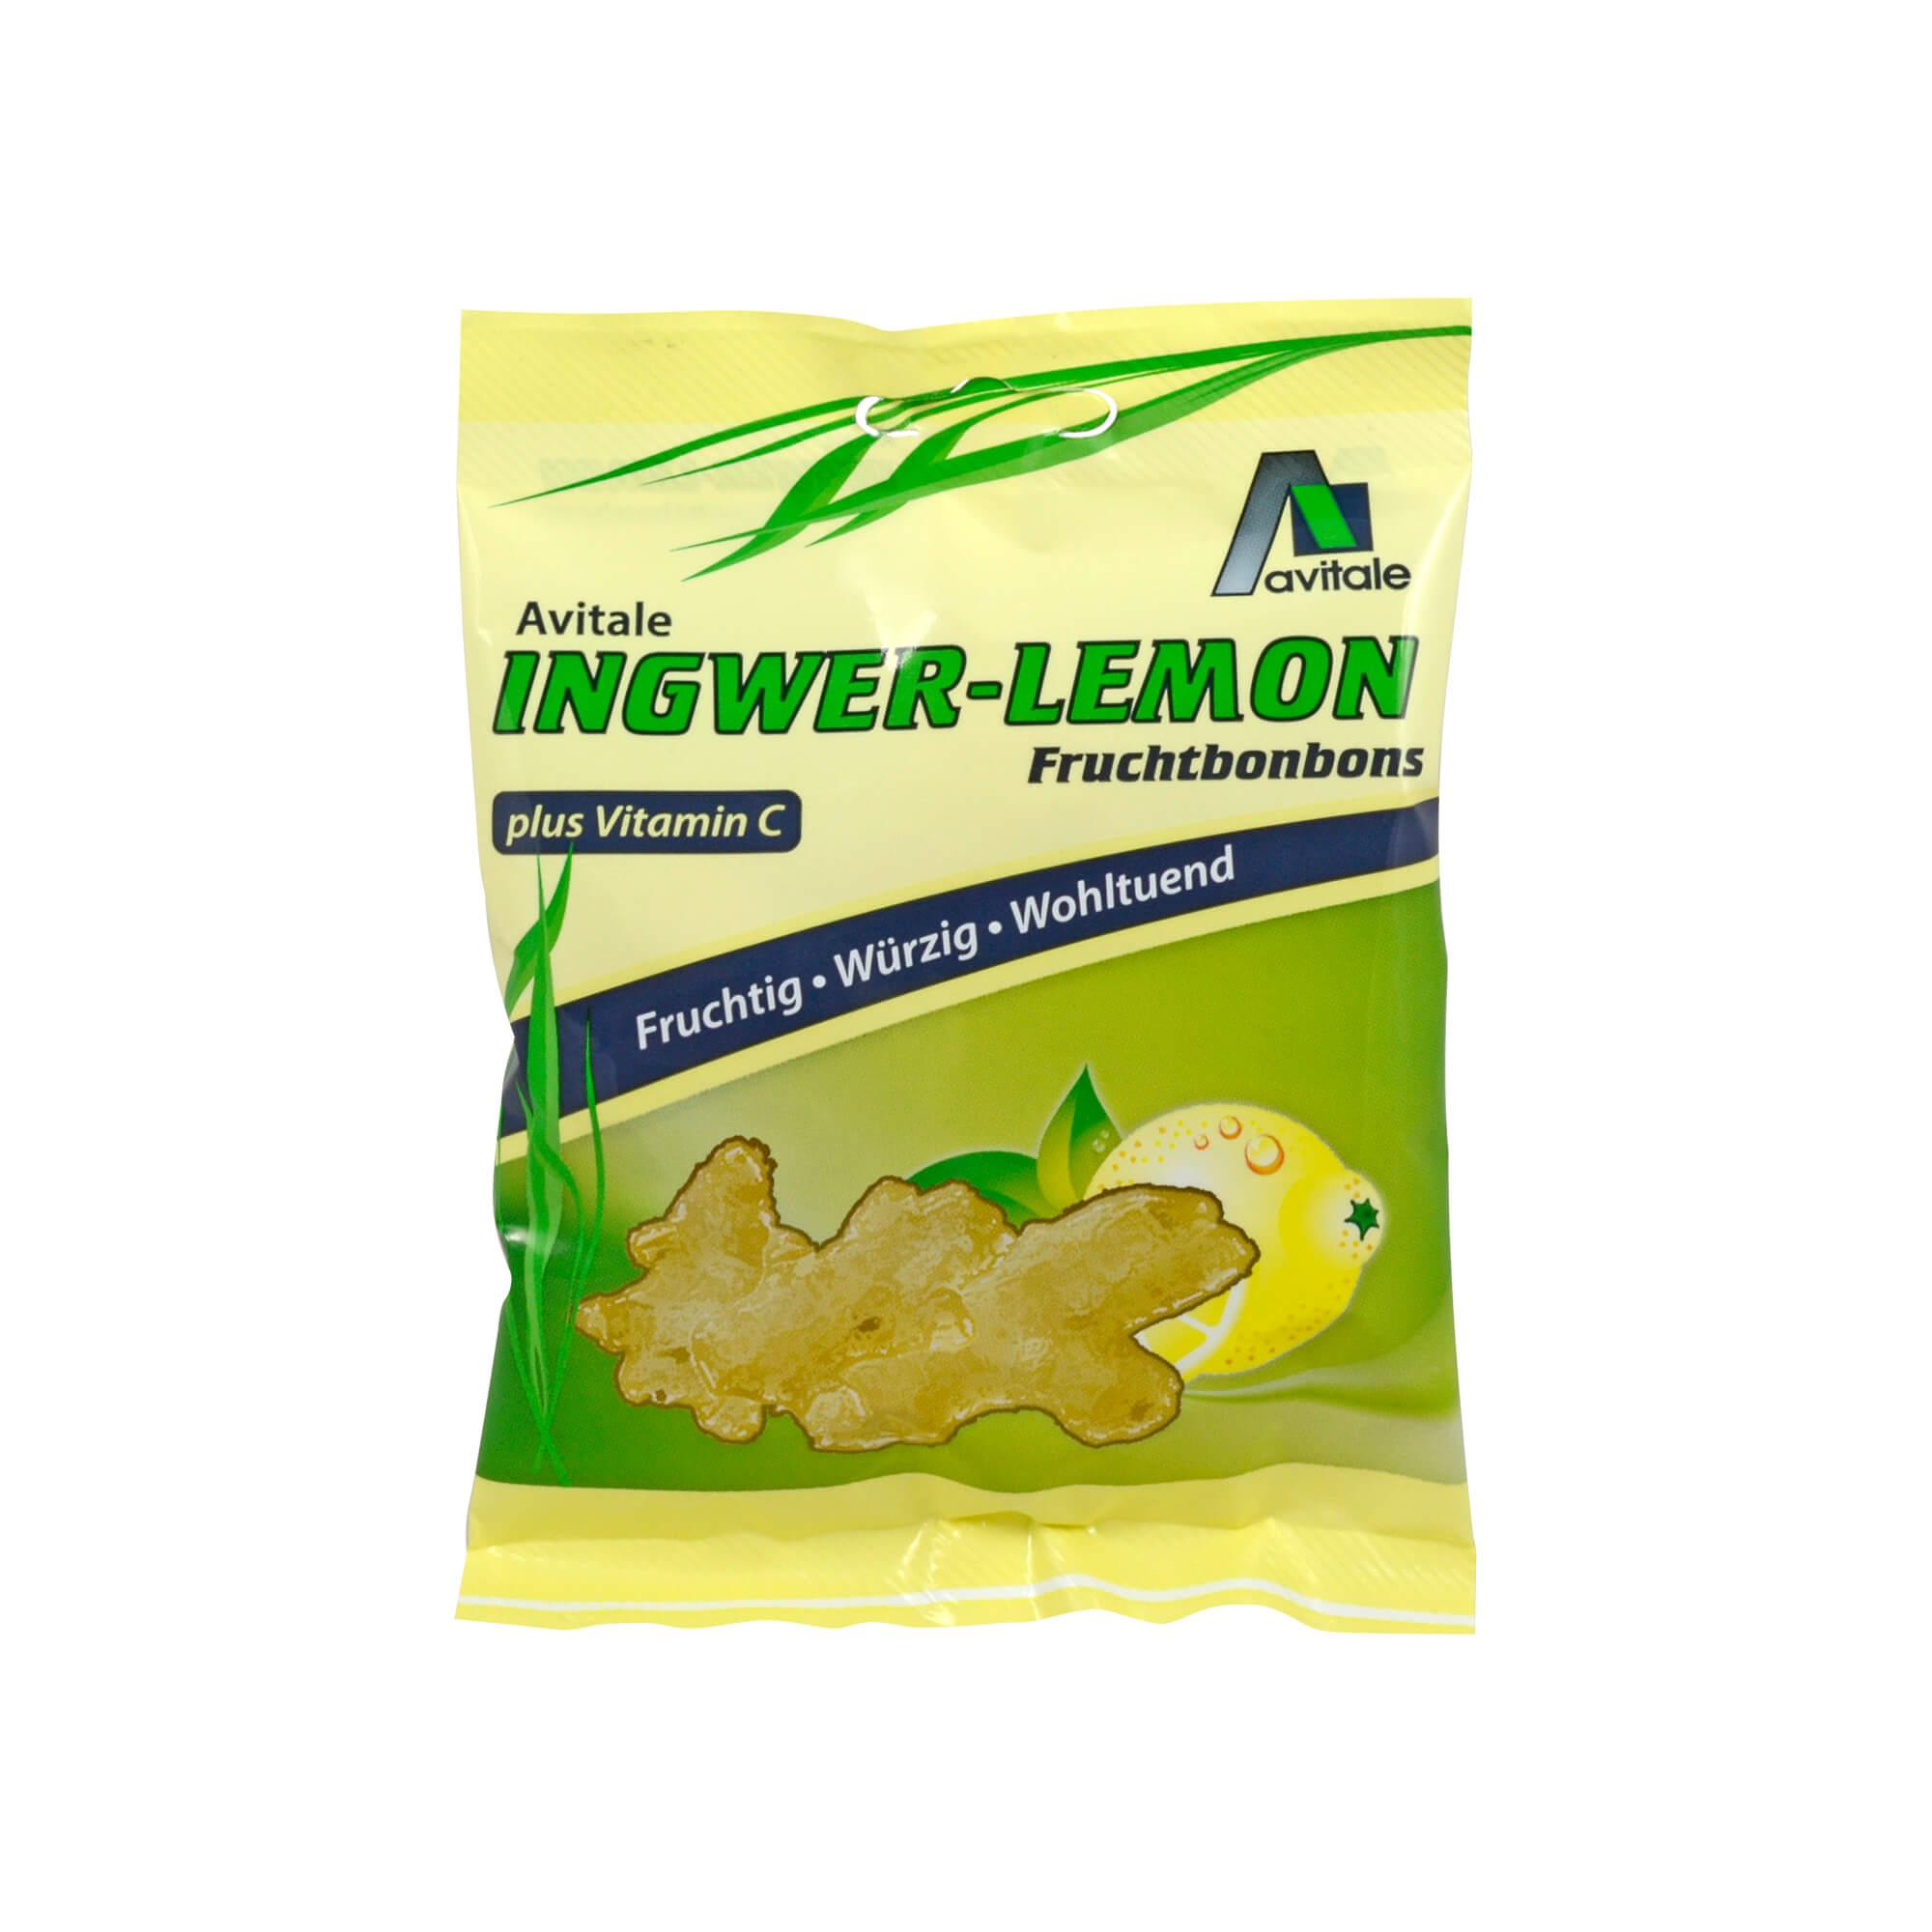 Ingwer Lemon Fruchtbonbons